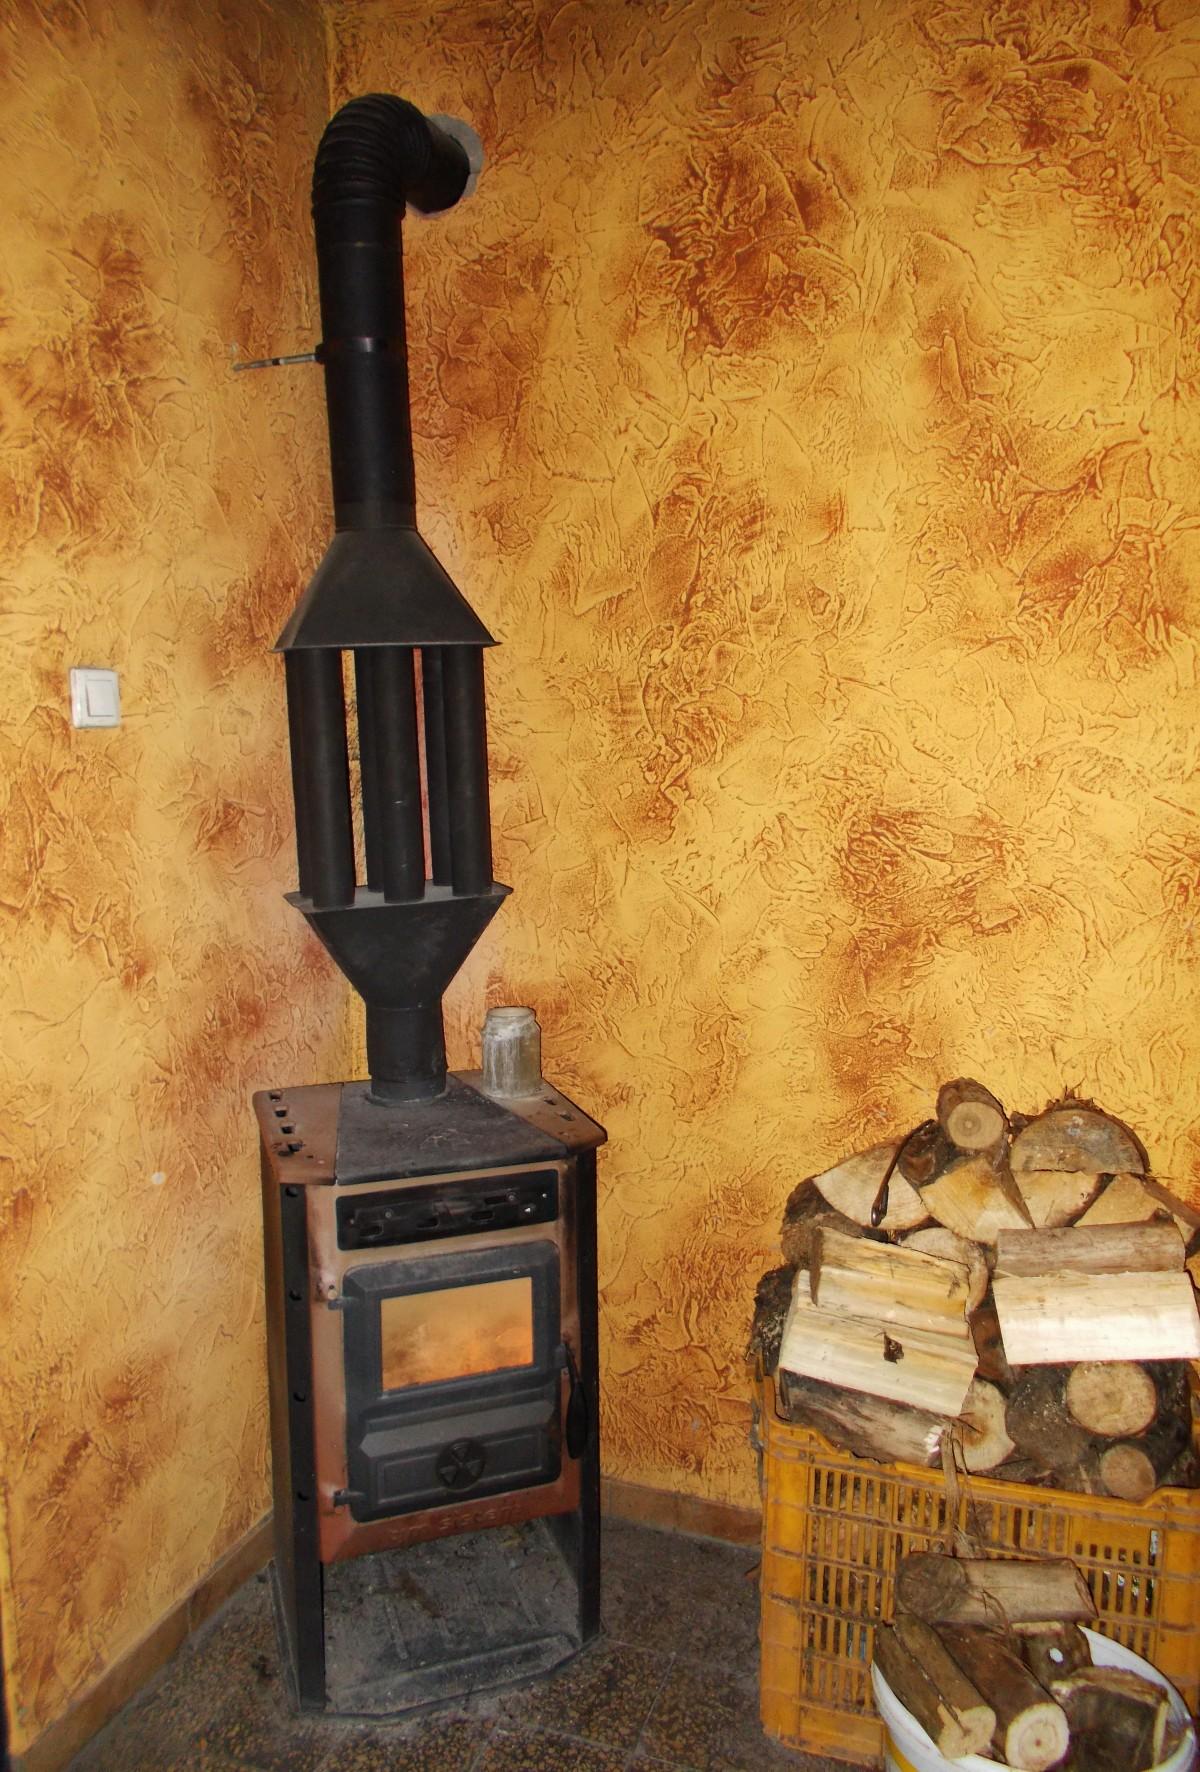 Fotos gratis madera chimenea negro mueble habitaci n - Hogar chimenea lena ...